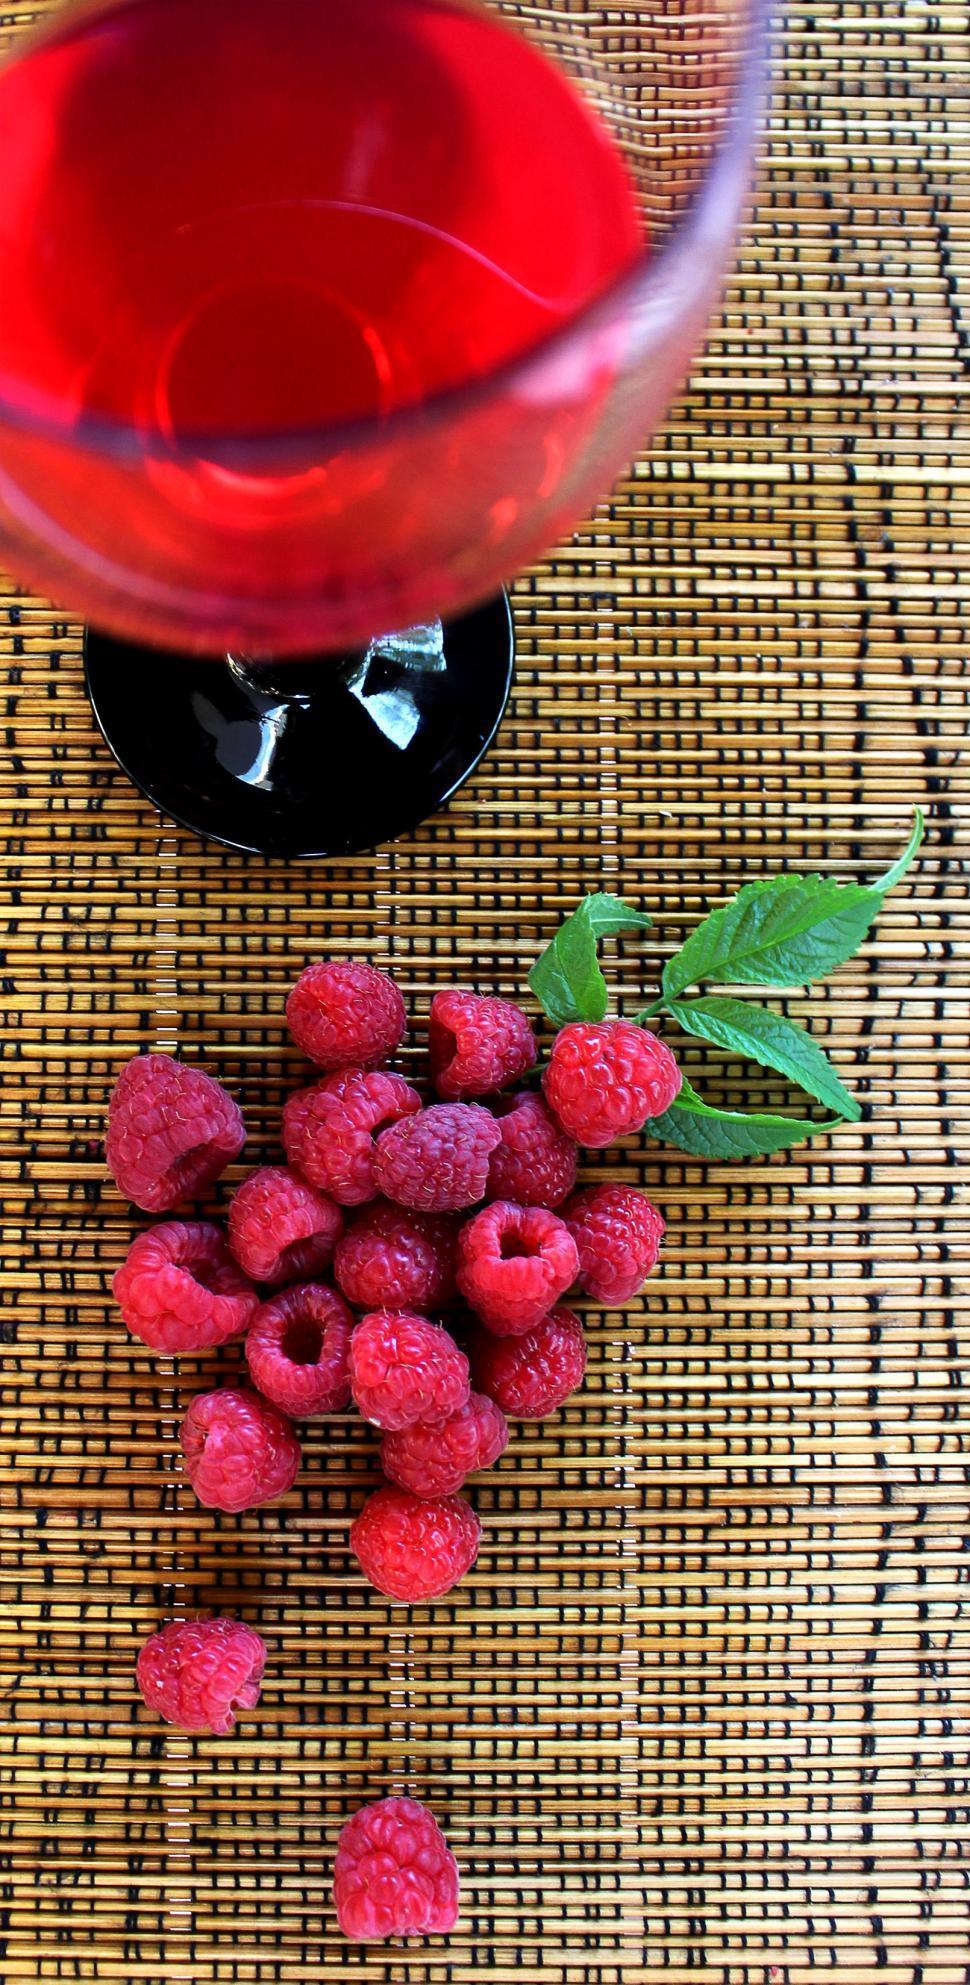 Download Free Stock HD Photo of Juicy raspeberries Online